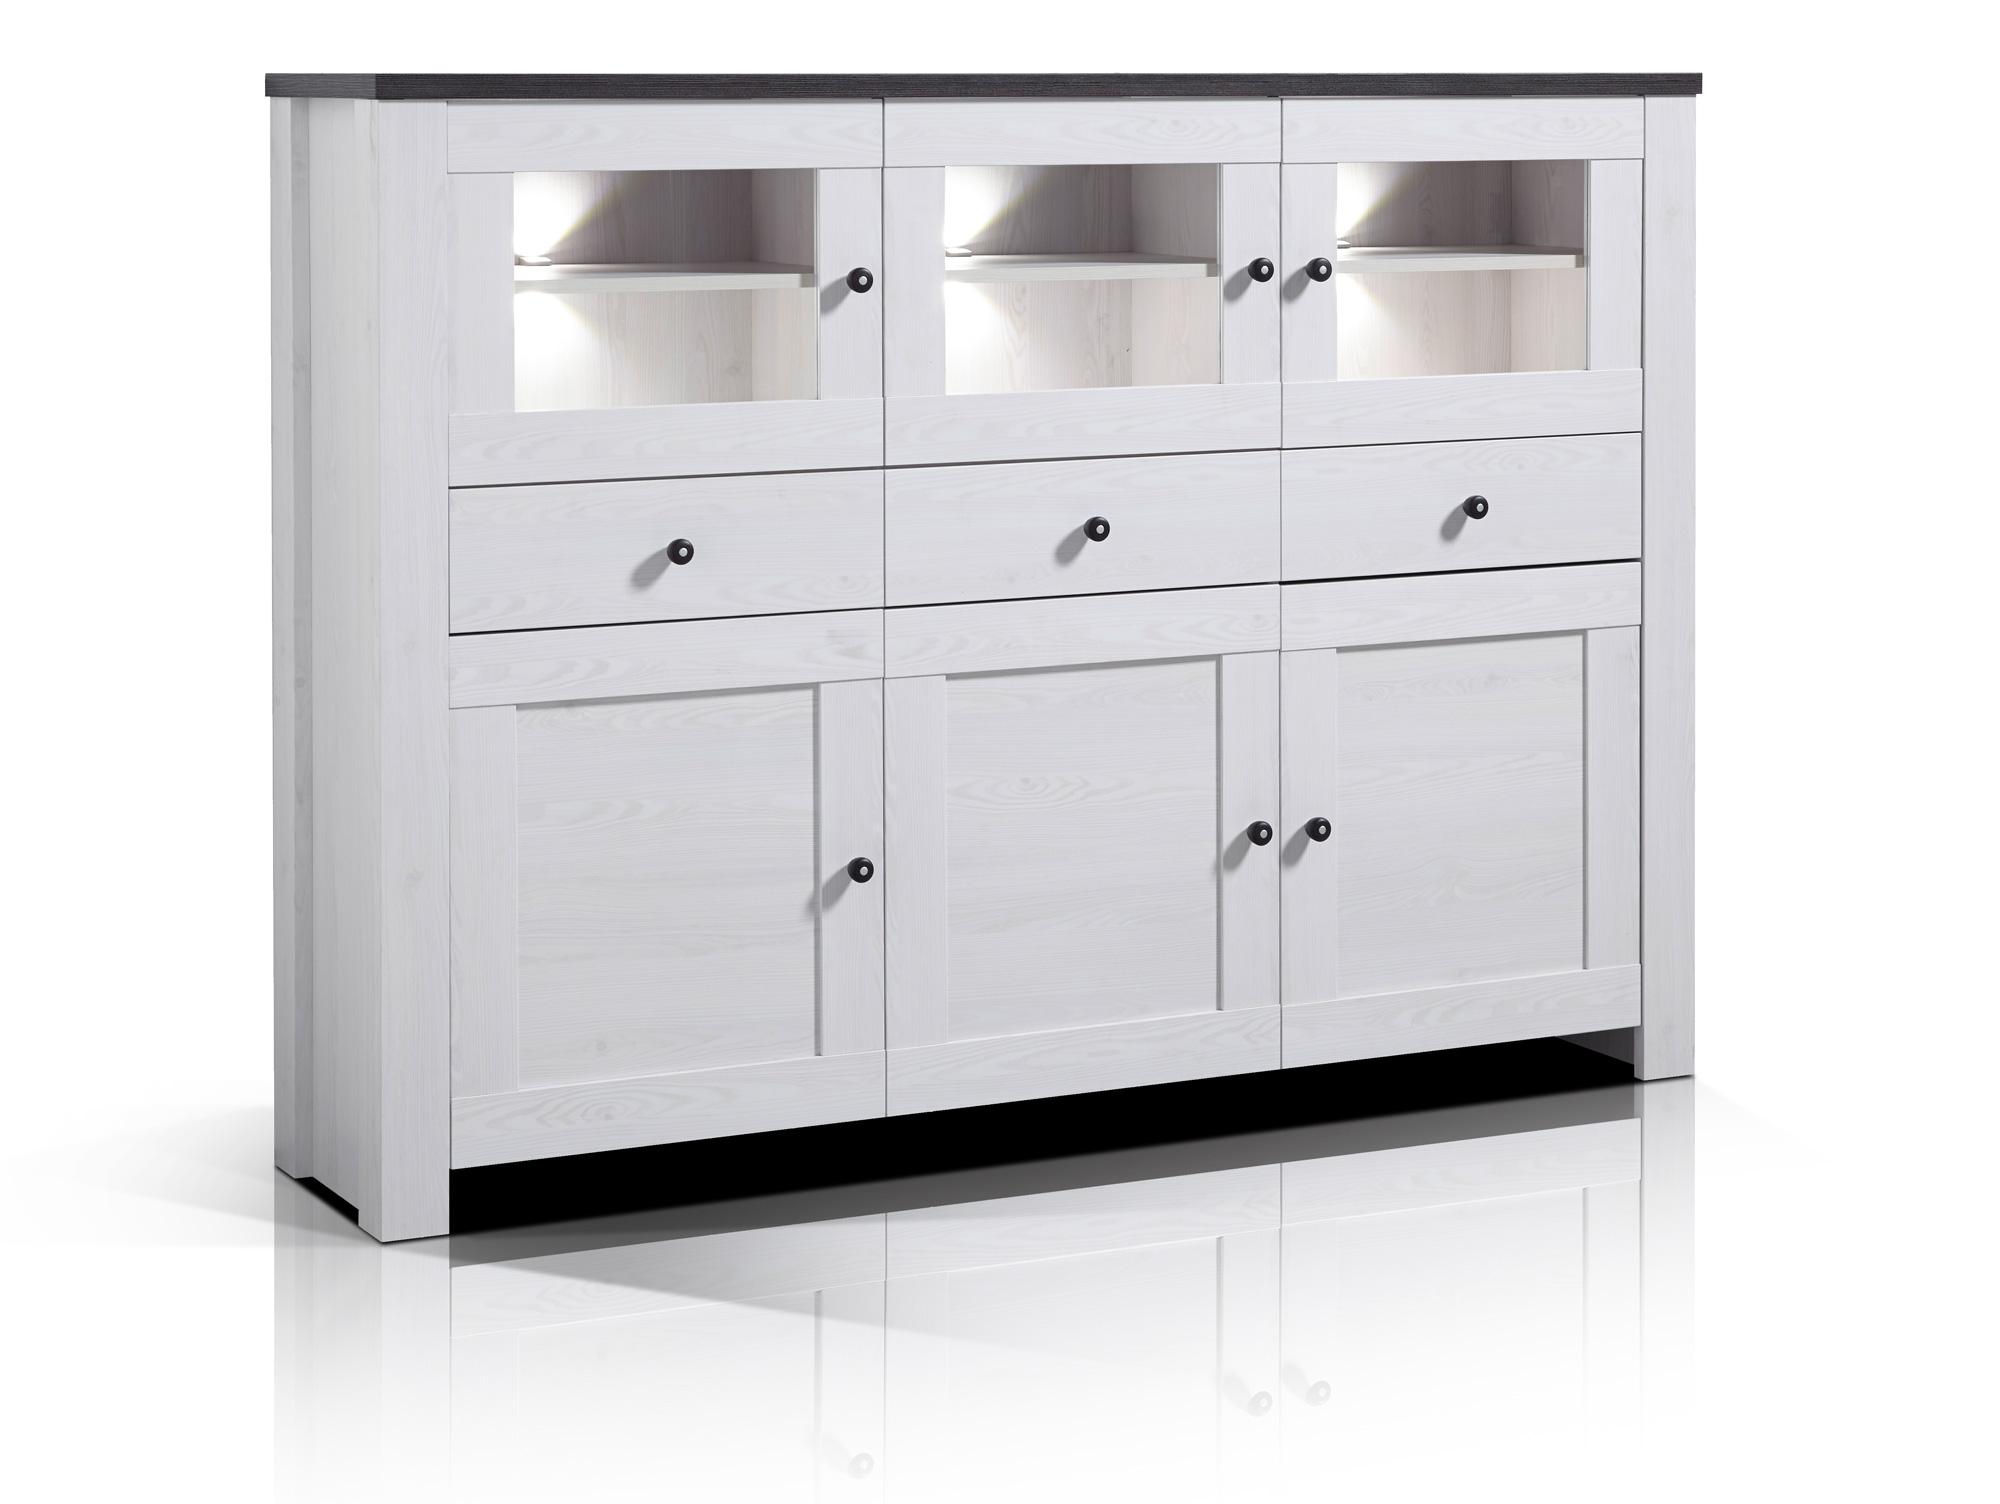 antwerpen highboard l rche pinie dunkel. Black Bedroom Furniture Sets. Home Design Ideas